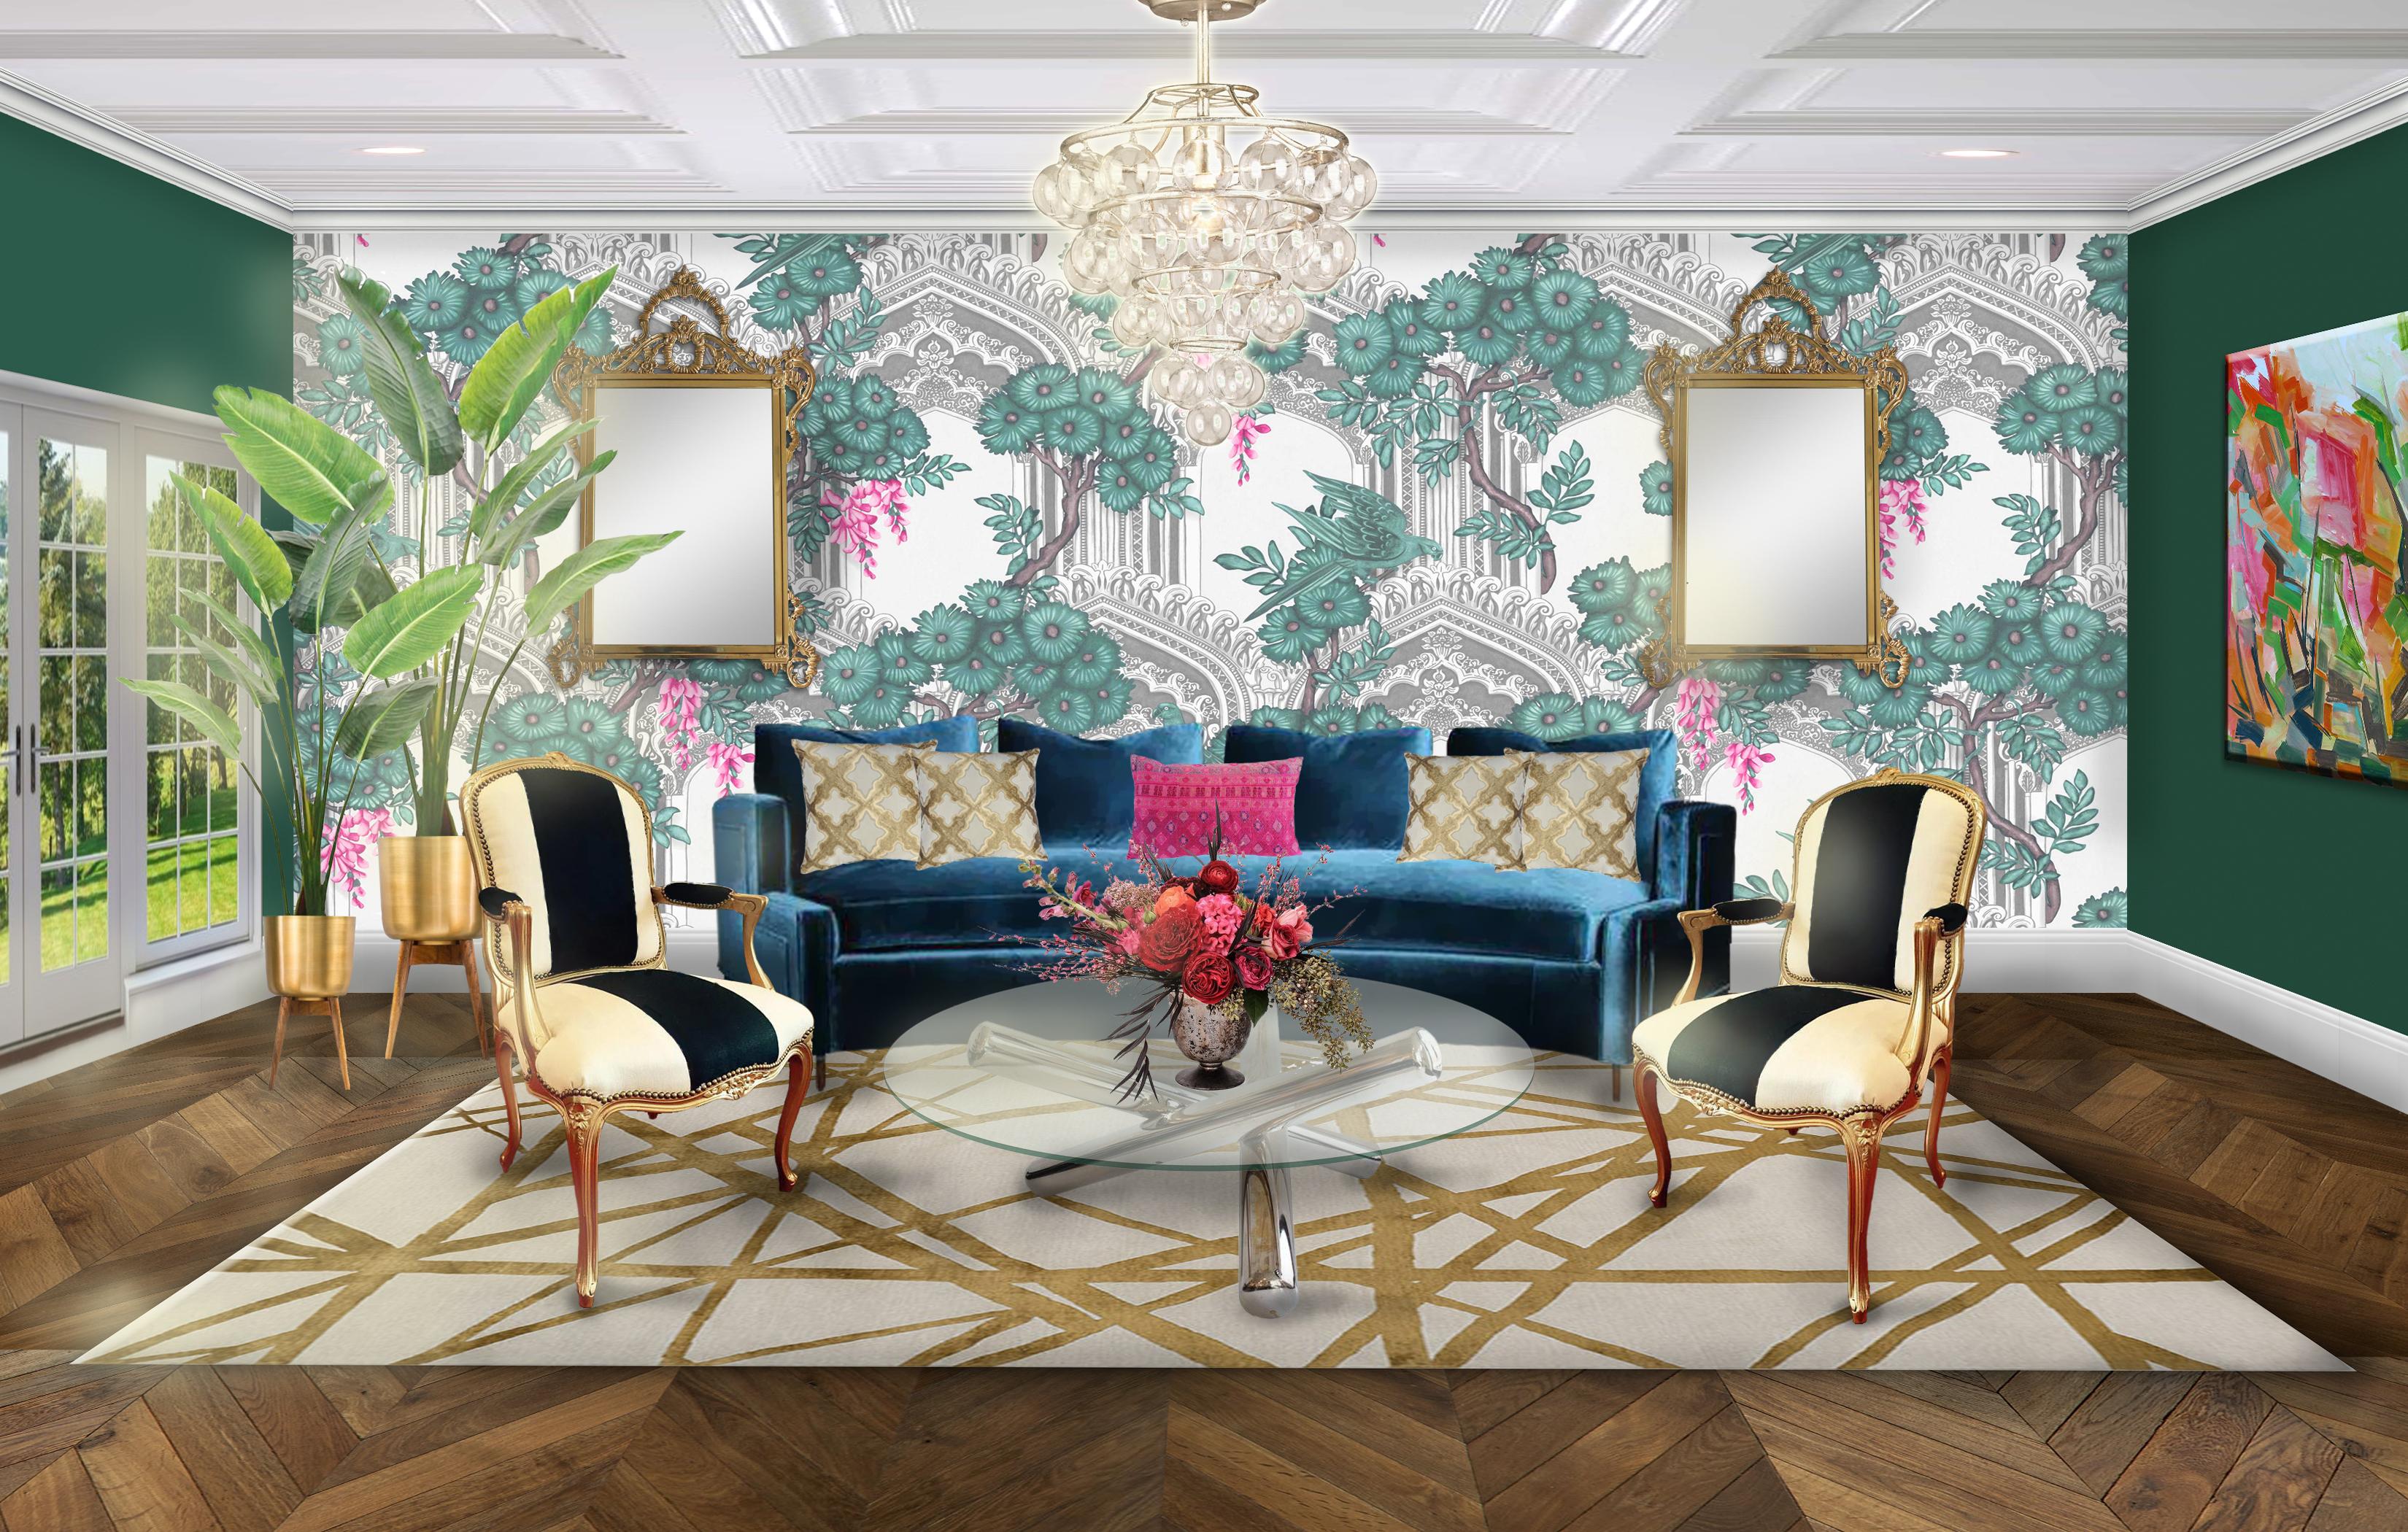 AW Design Studio – House Plans & Interior Design